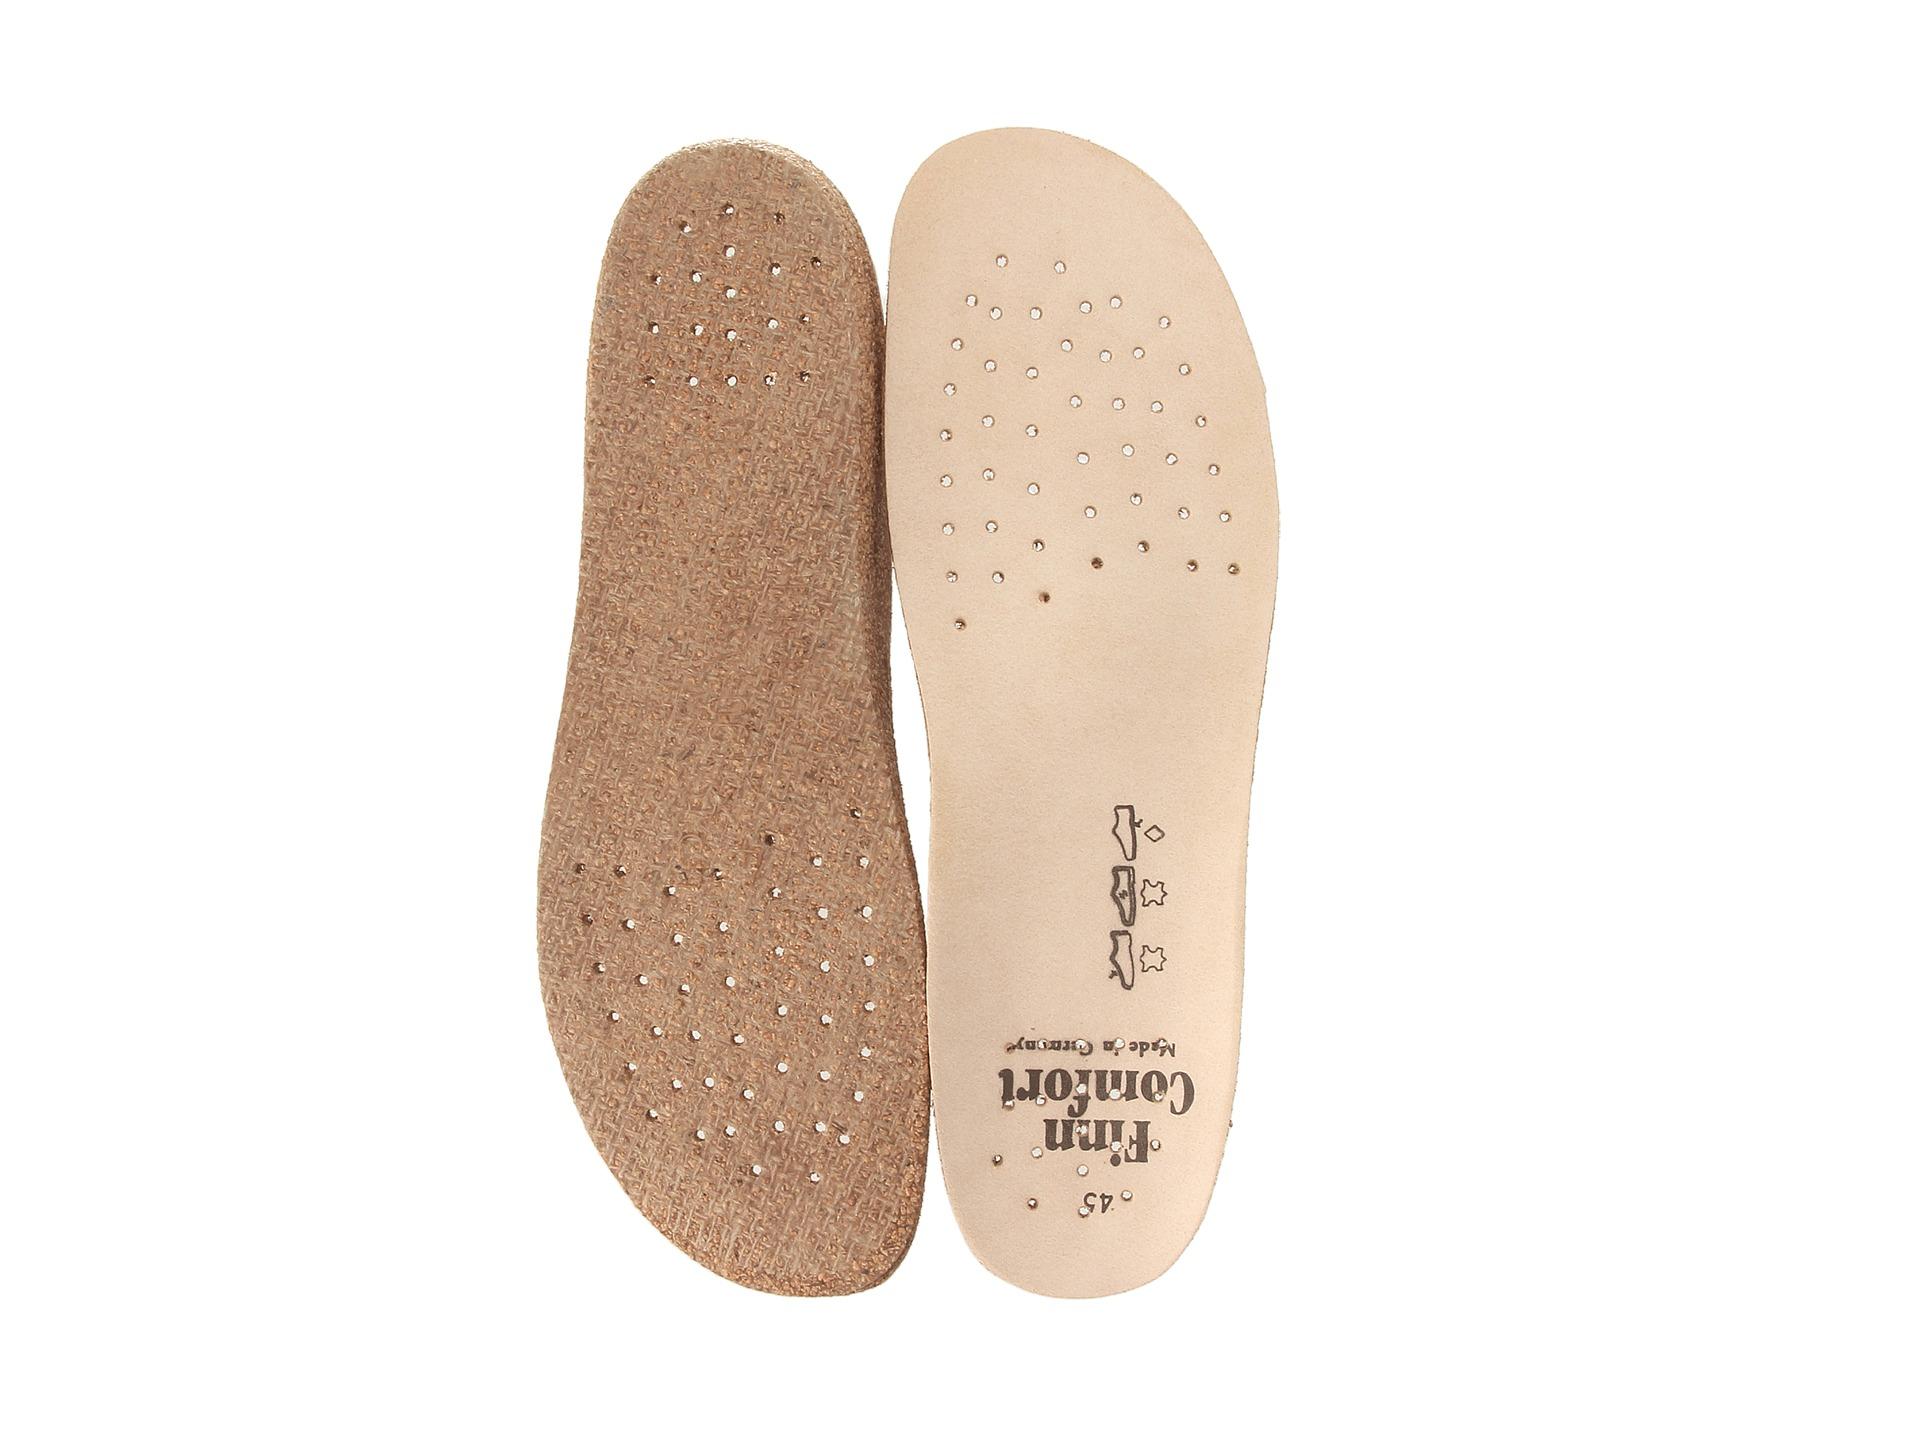 Vans Shoe Sole Replacement